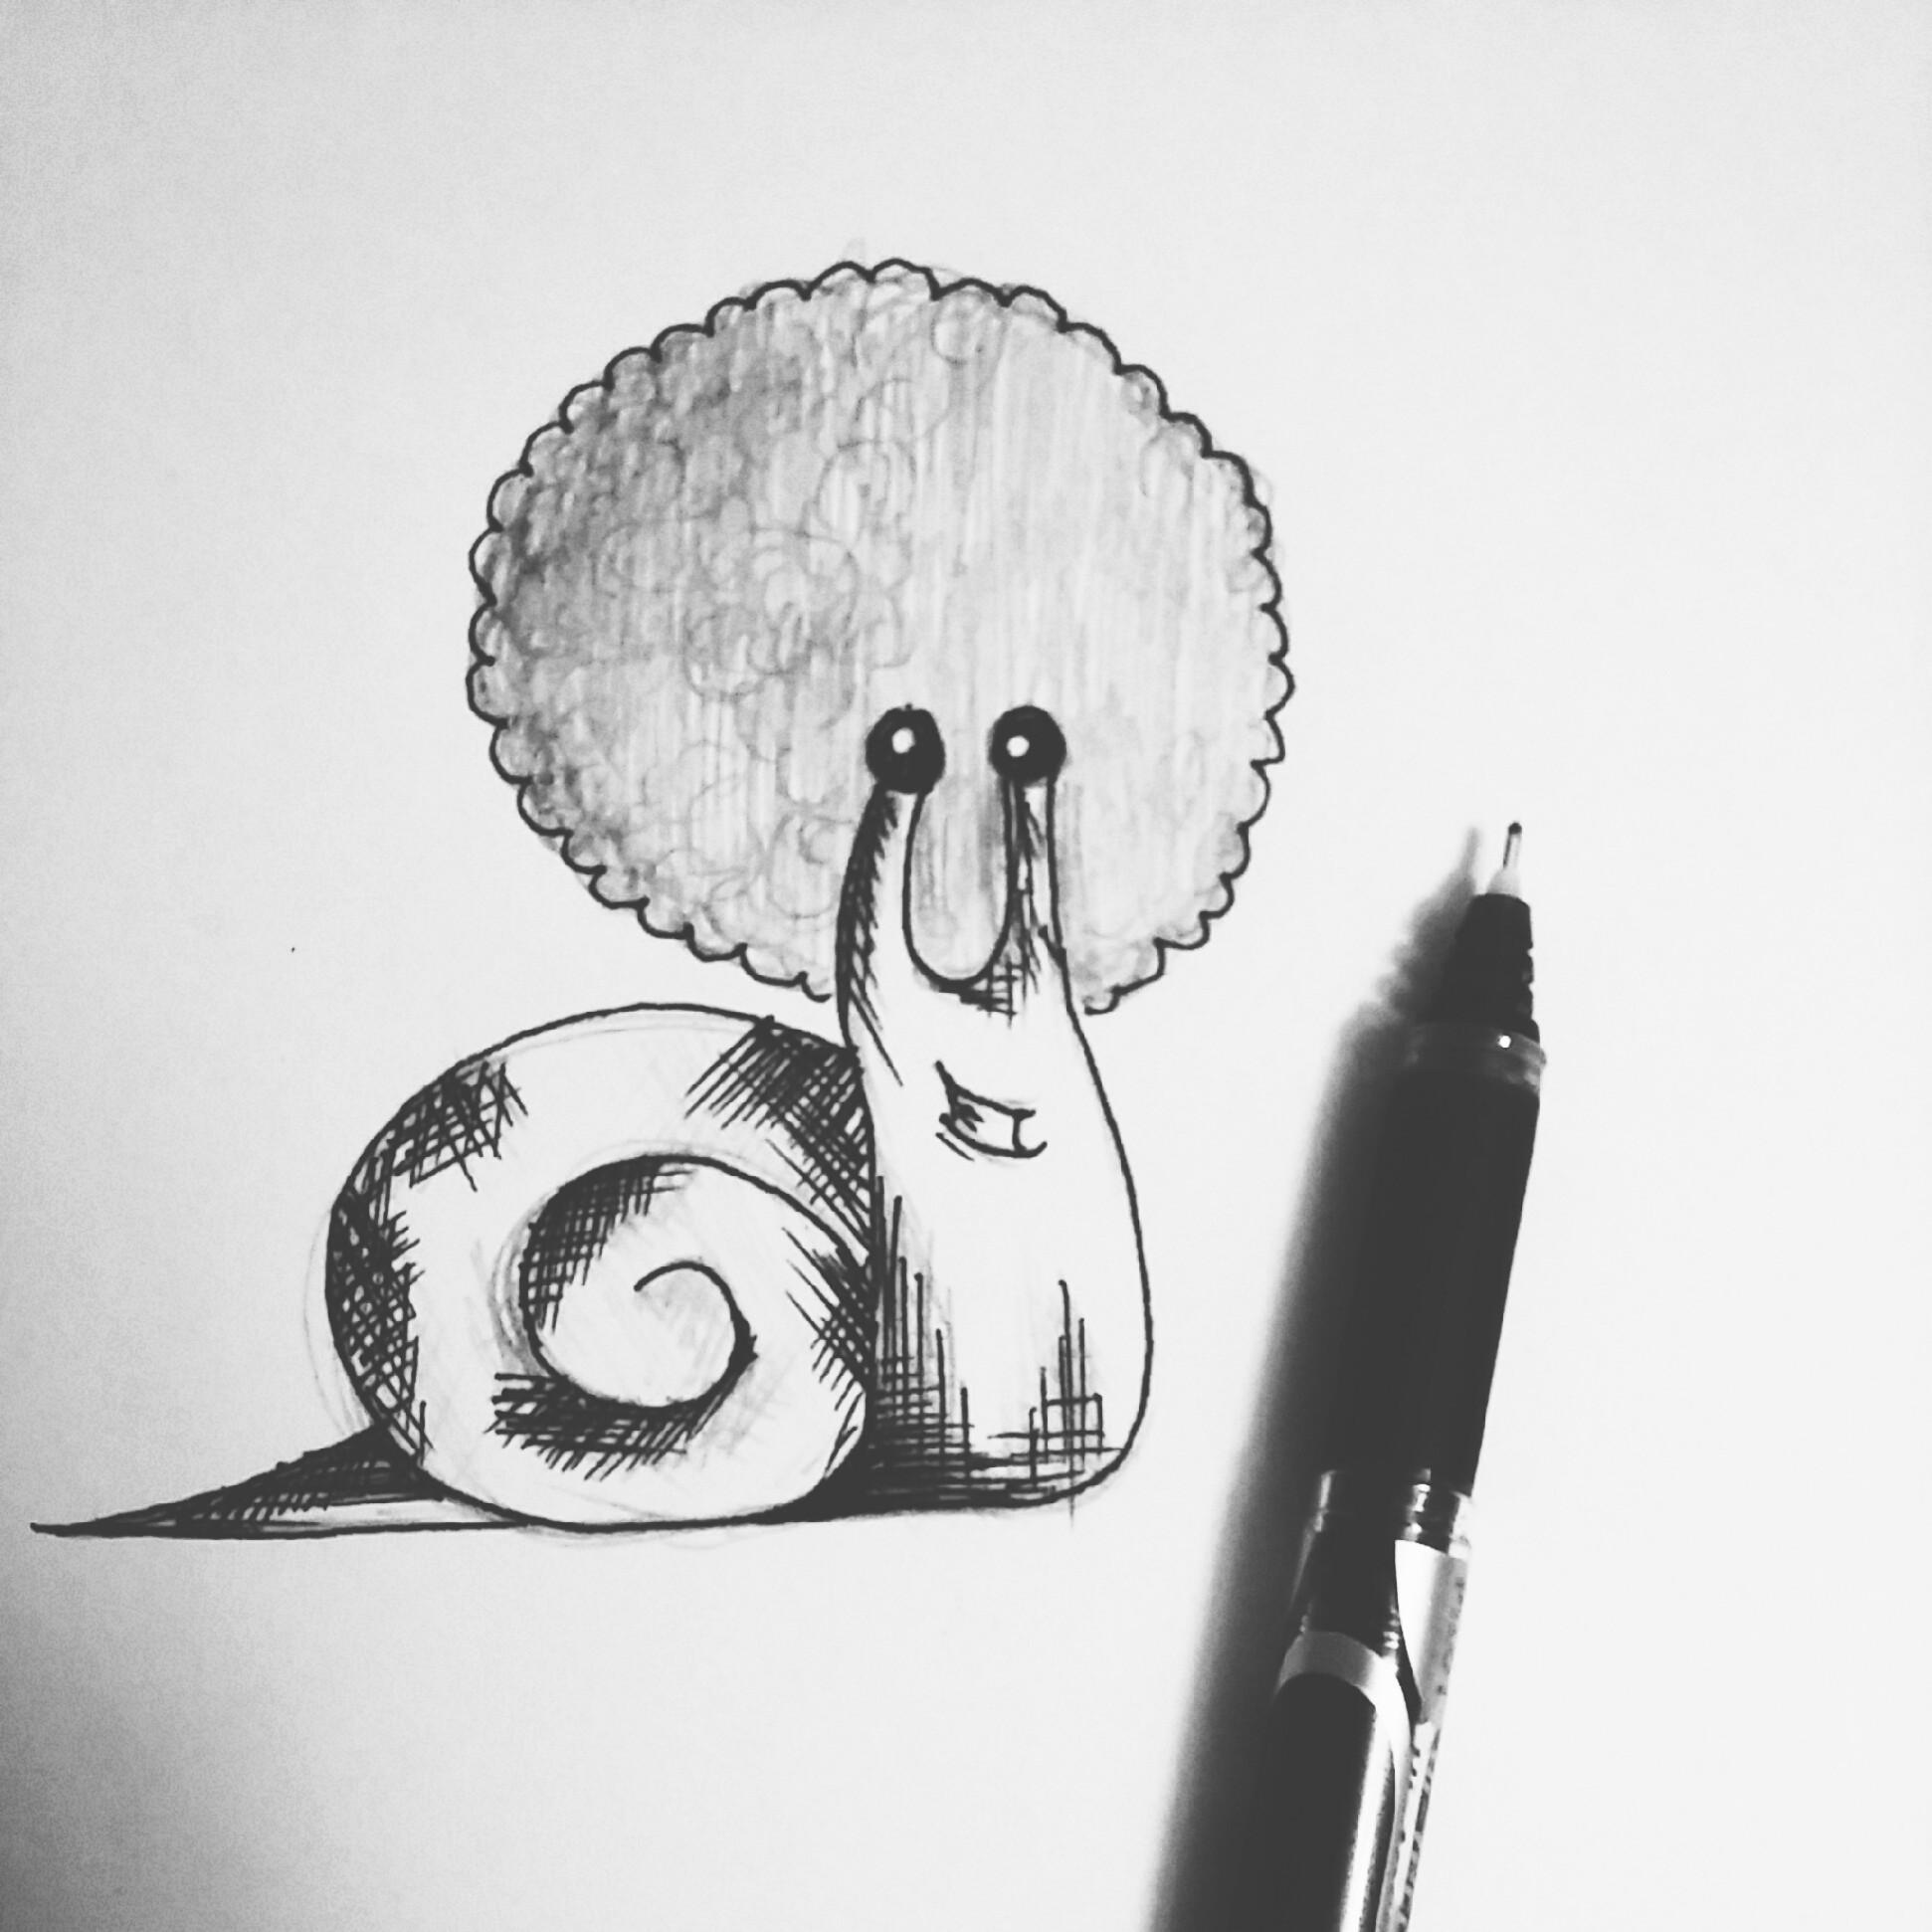 afro snail